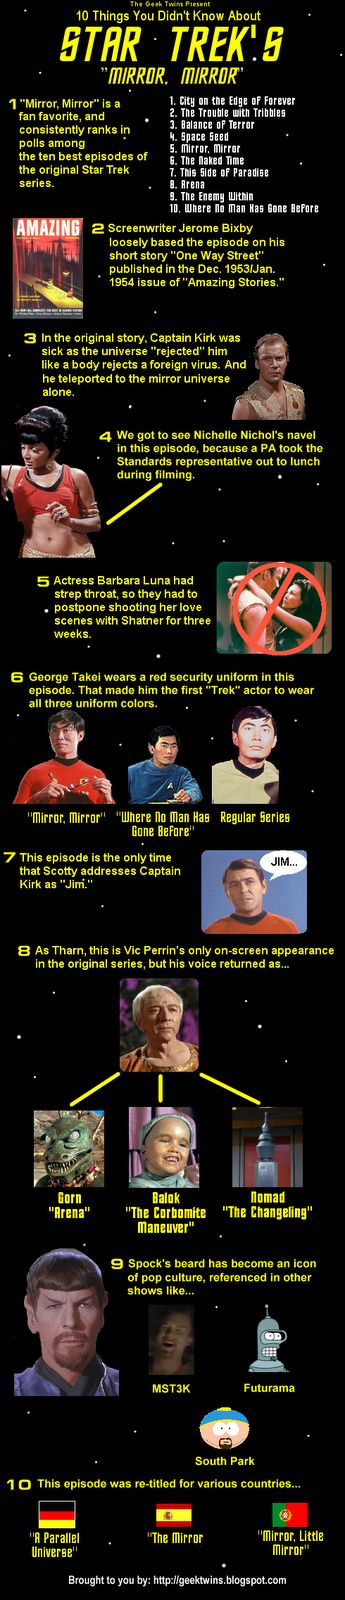 "10 Things You Didn't Know About Star Trek's ""Mirror, Mirror""  Visual Loop"